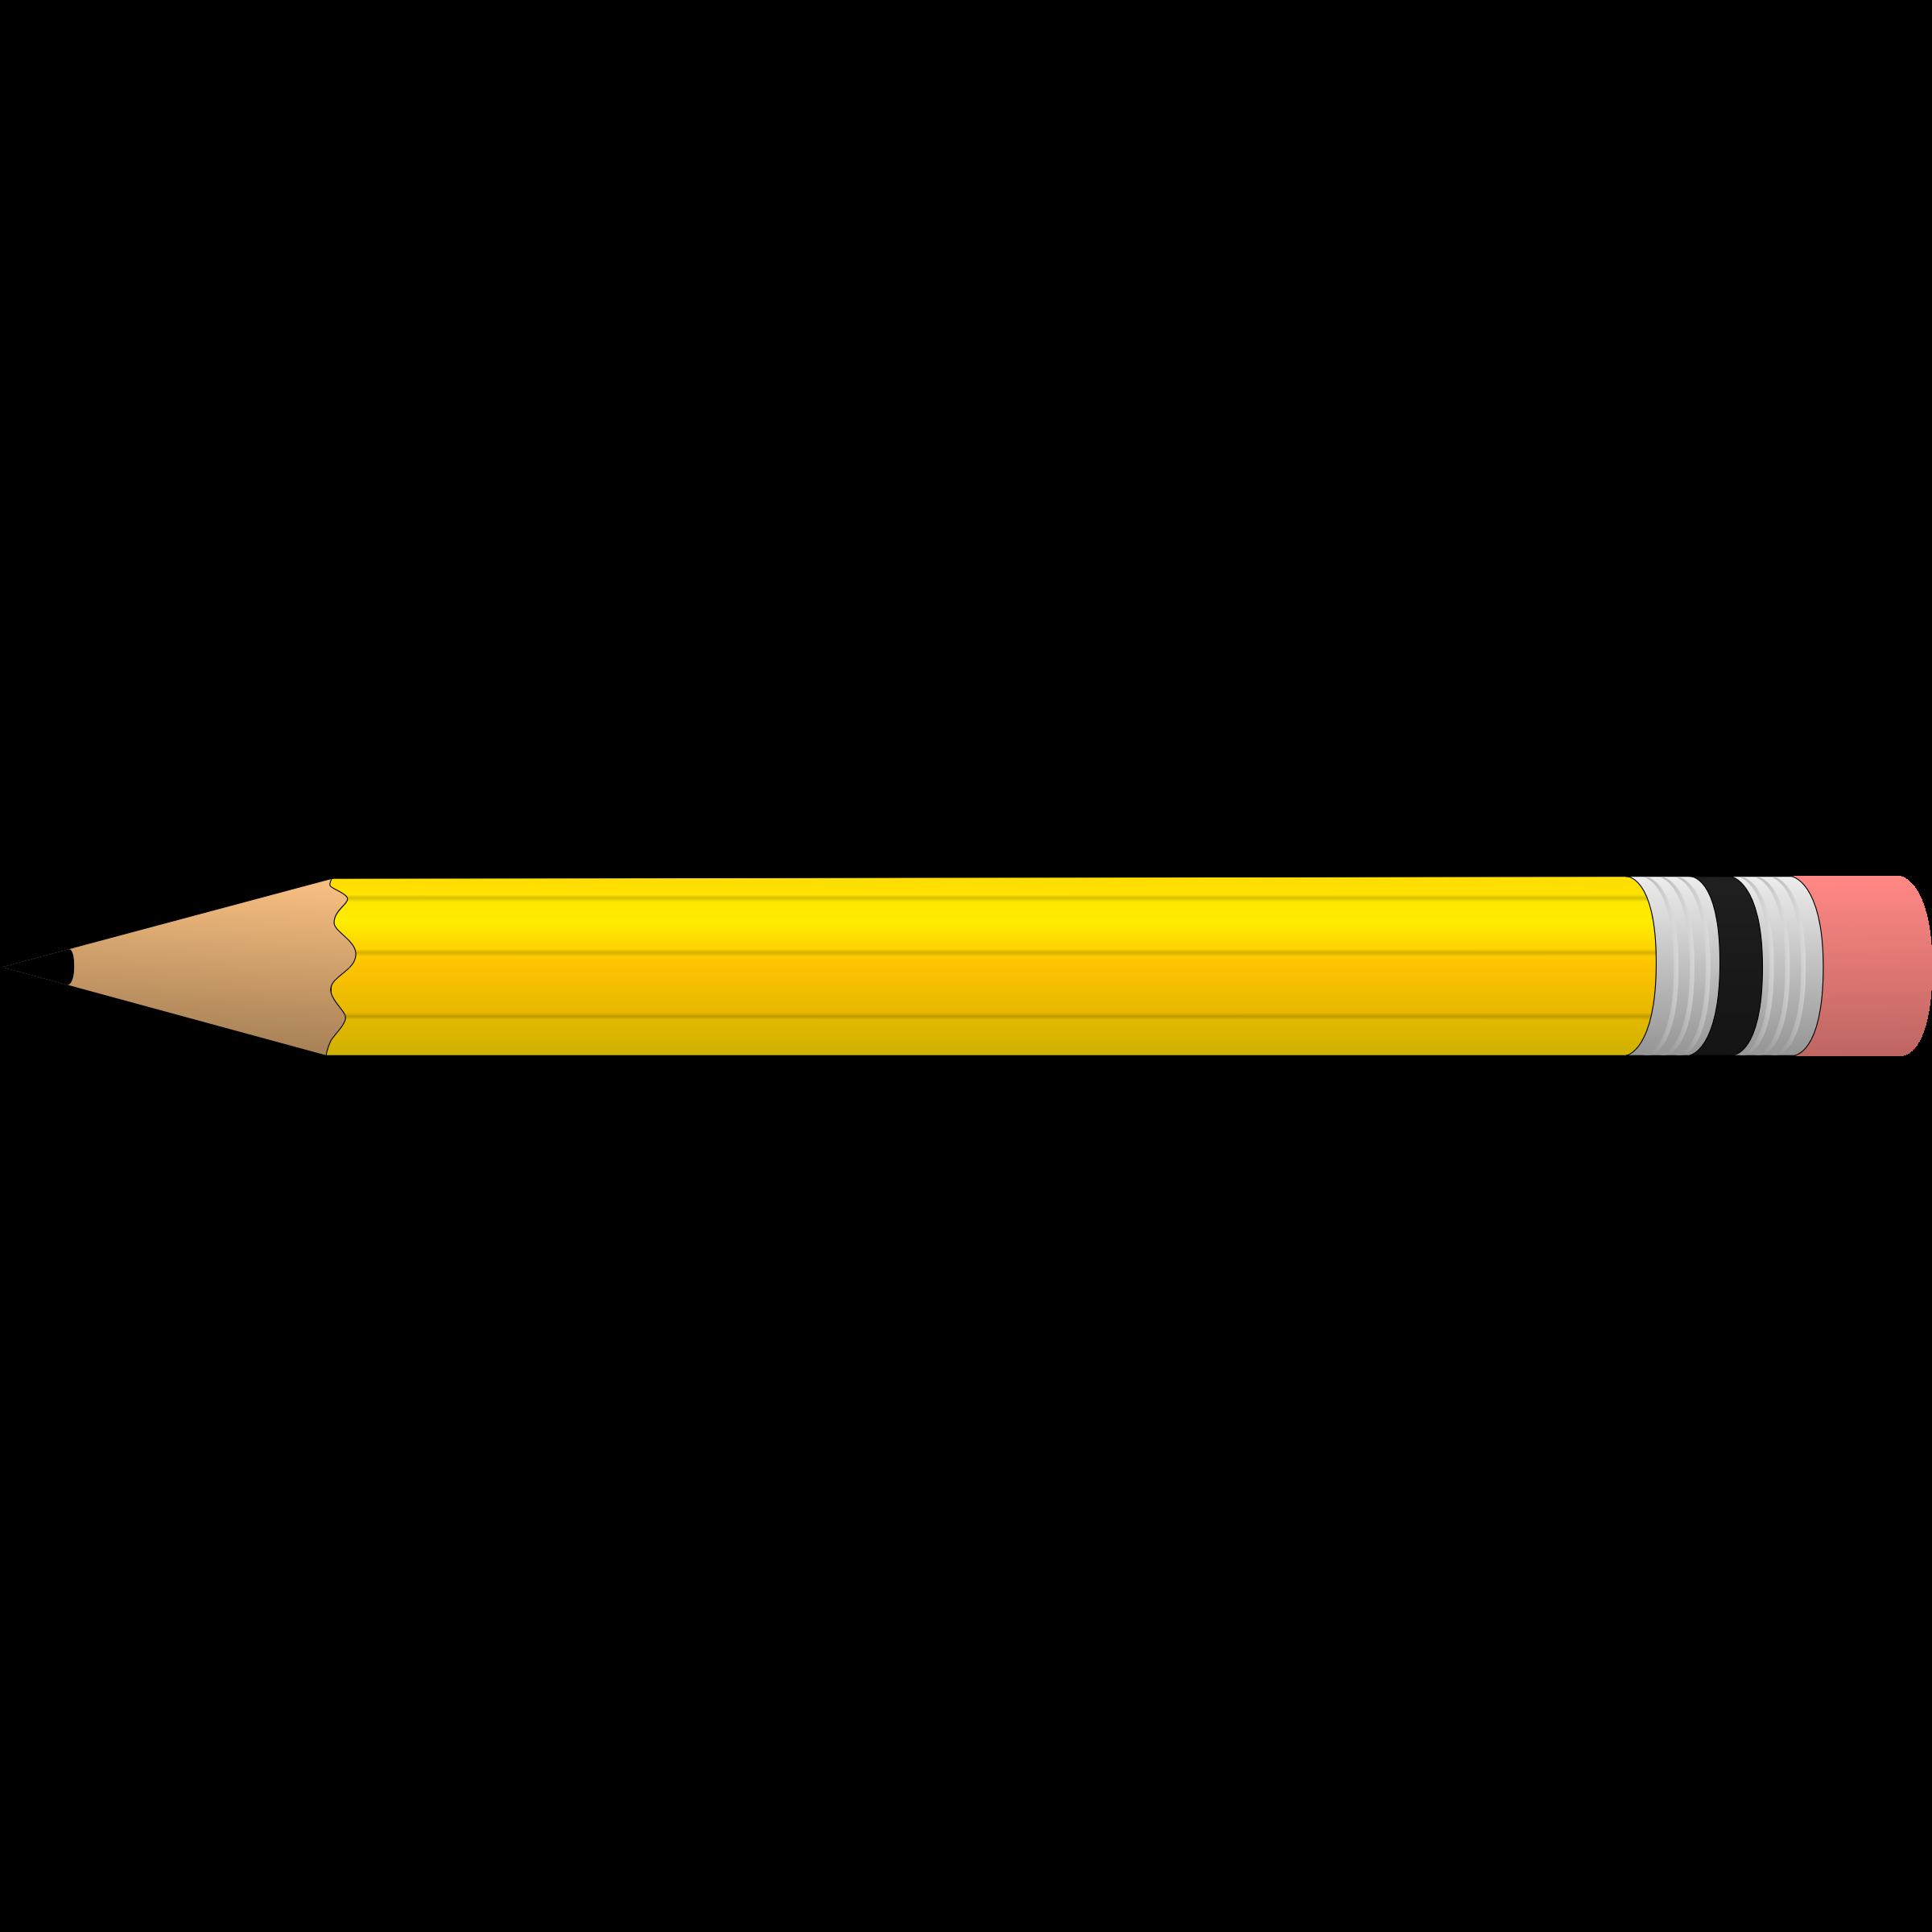 Top pencil for clip art free clipart image - Pencil HD PNG